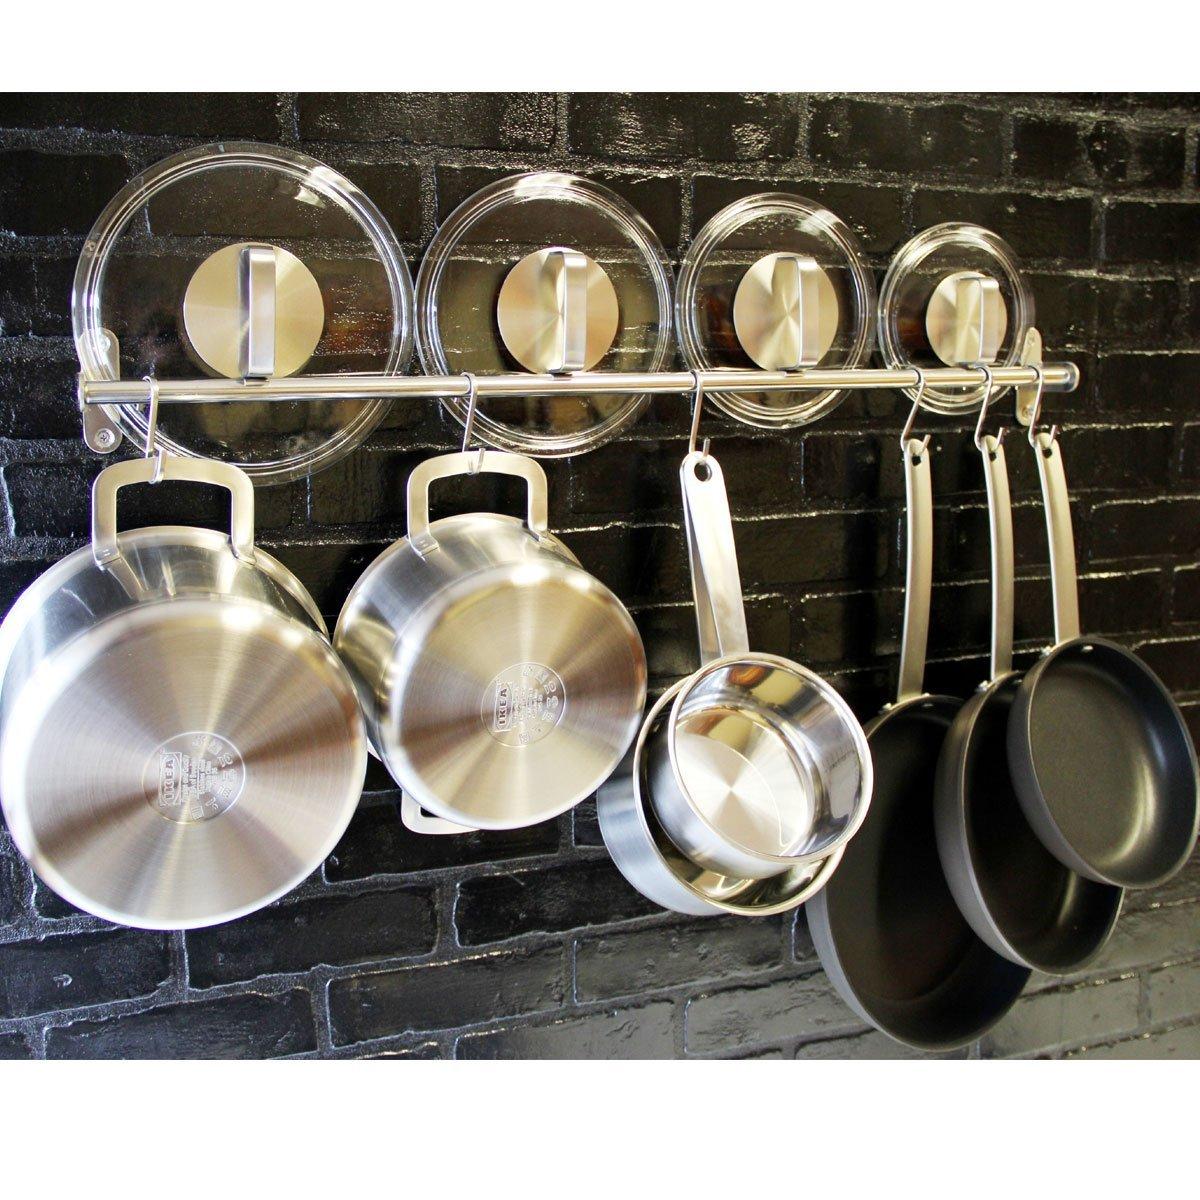 wall mount pot rack hook stainless steel kitchen hang utensils pan lid organizer. Black Bedroom Furniture Sets. Home Design Ideas